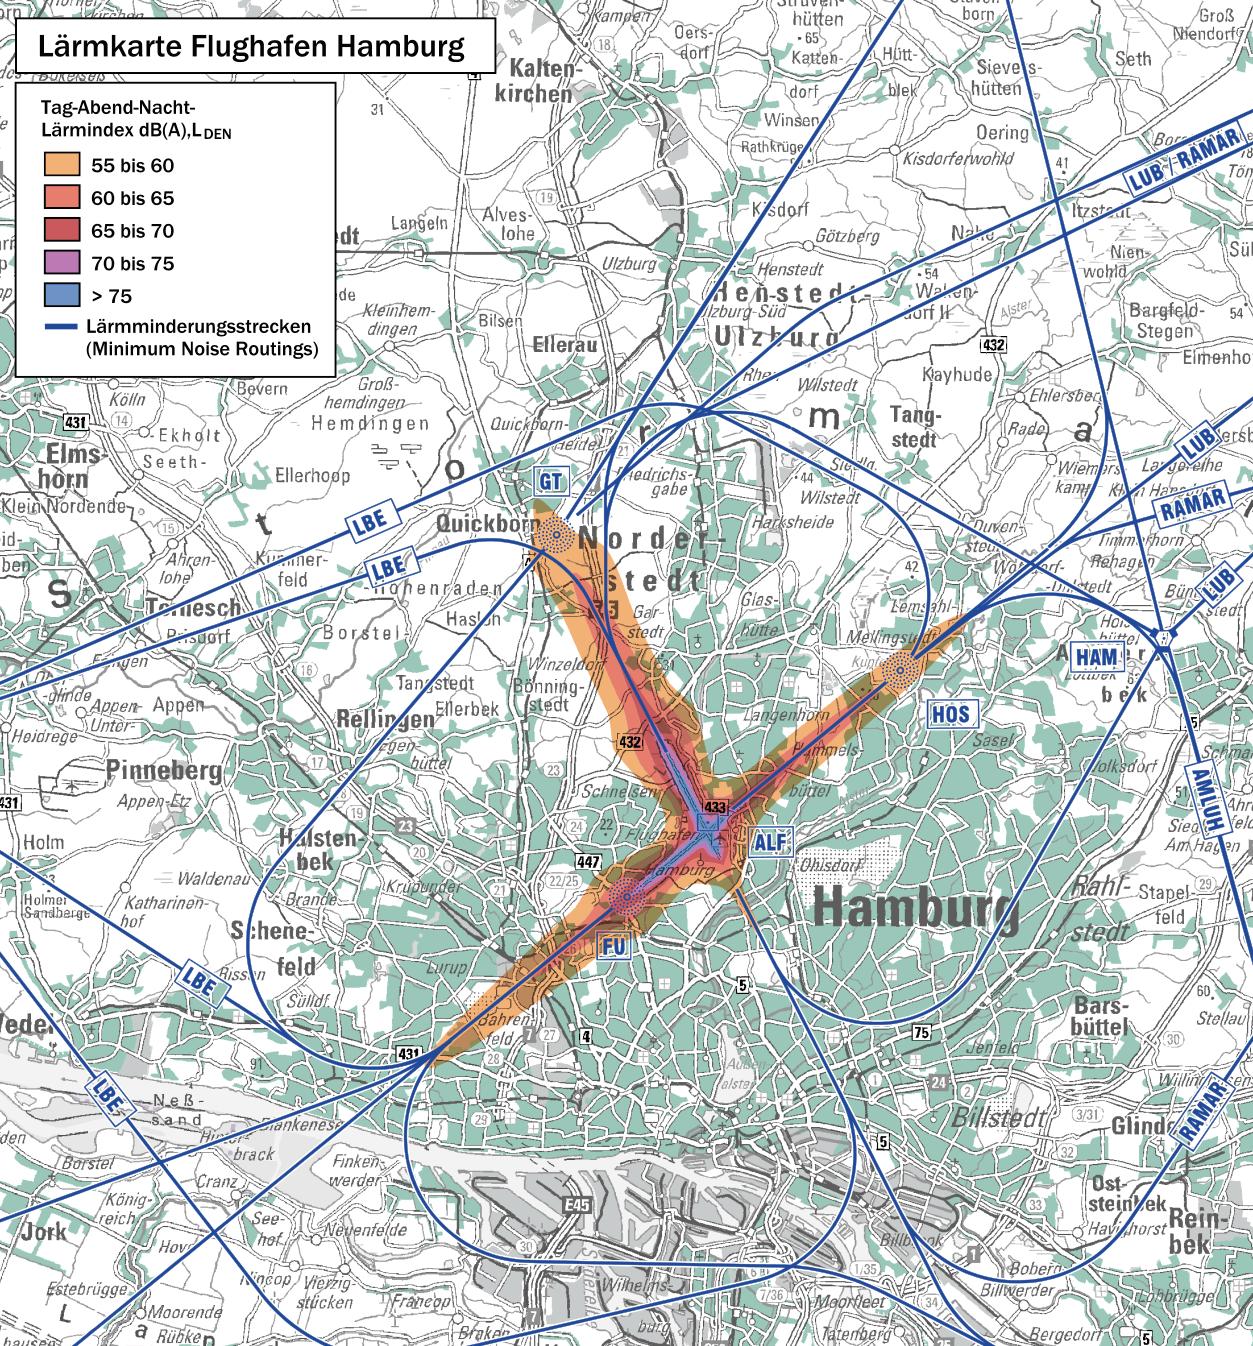 karte flughafen hamburg Datei:Lärmkarte Flughafen Hamburg.png – Wikipedia